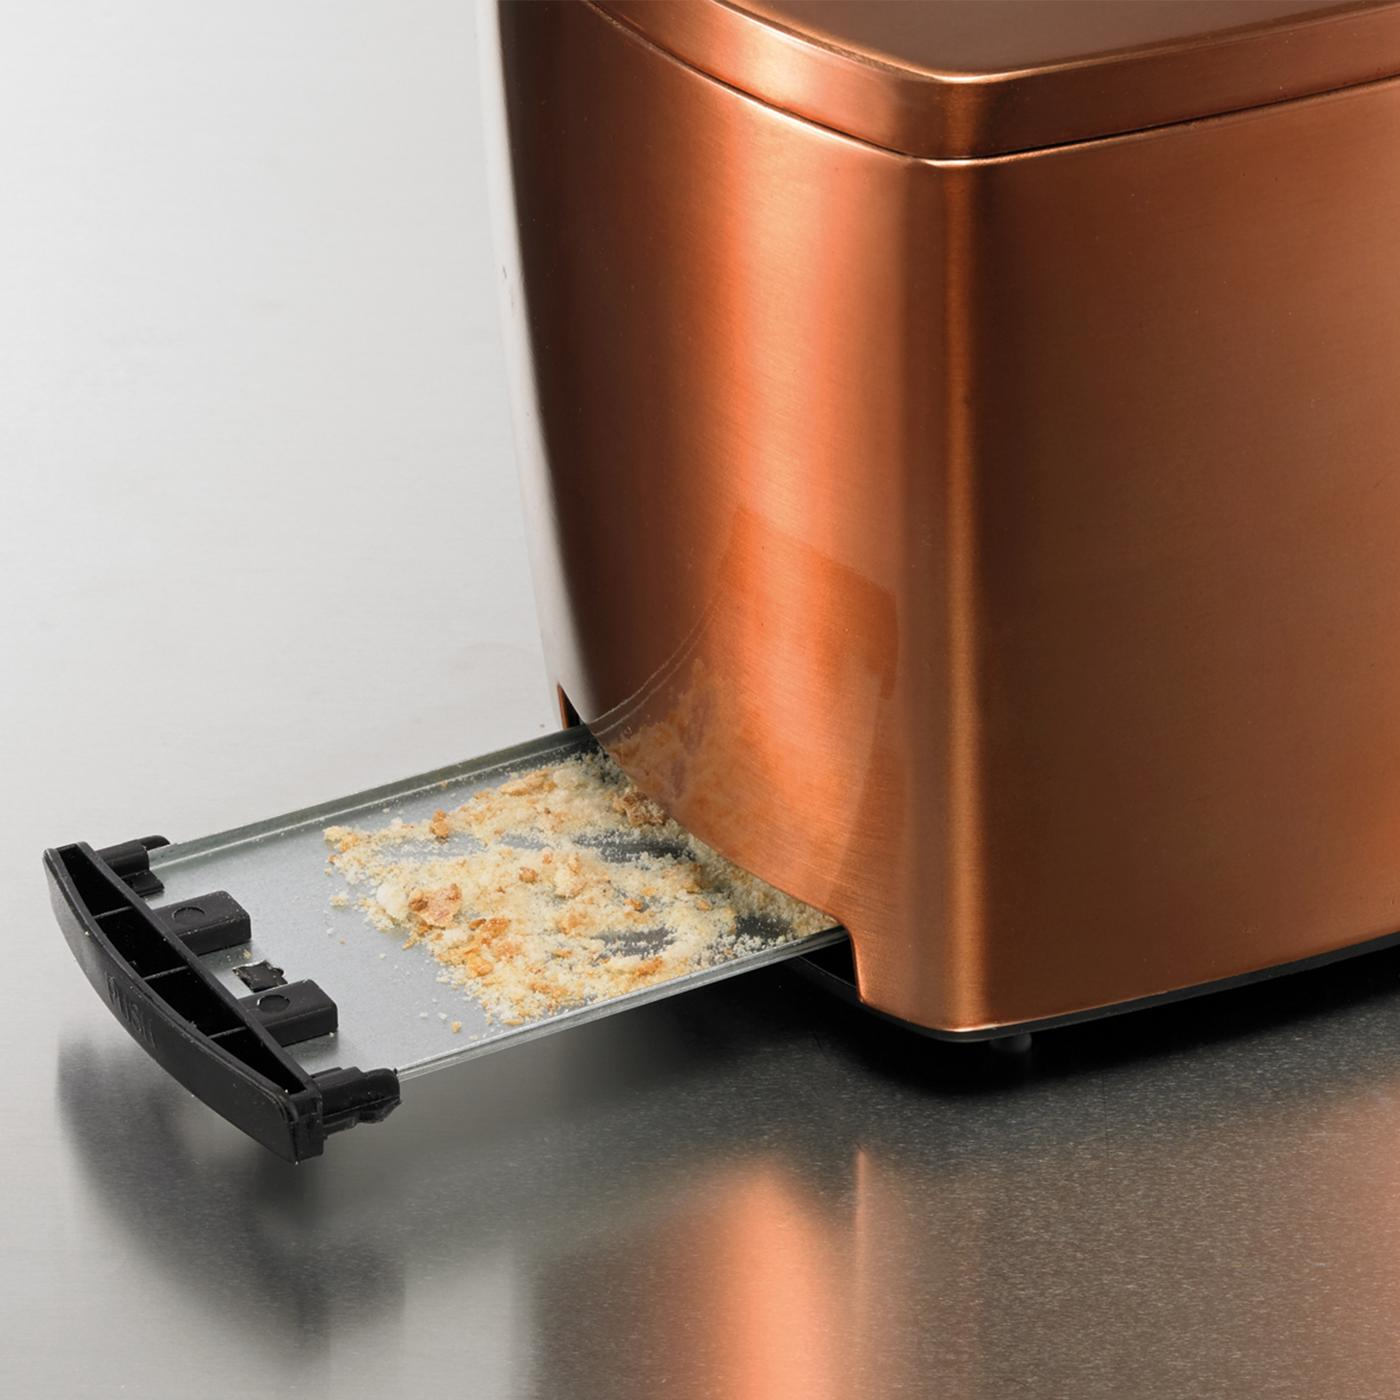 Kitchen Accessories Amazon Uk: BEEM Germany Nobilis Toaster, 800 Watt, Copper: Amazon.co